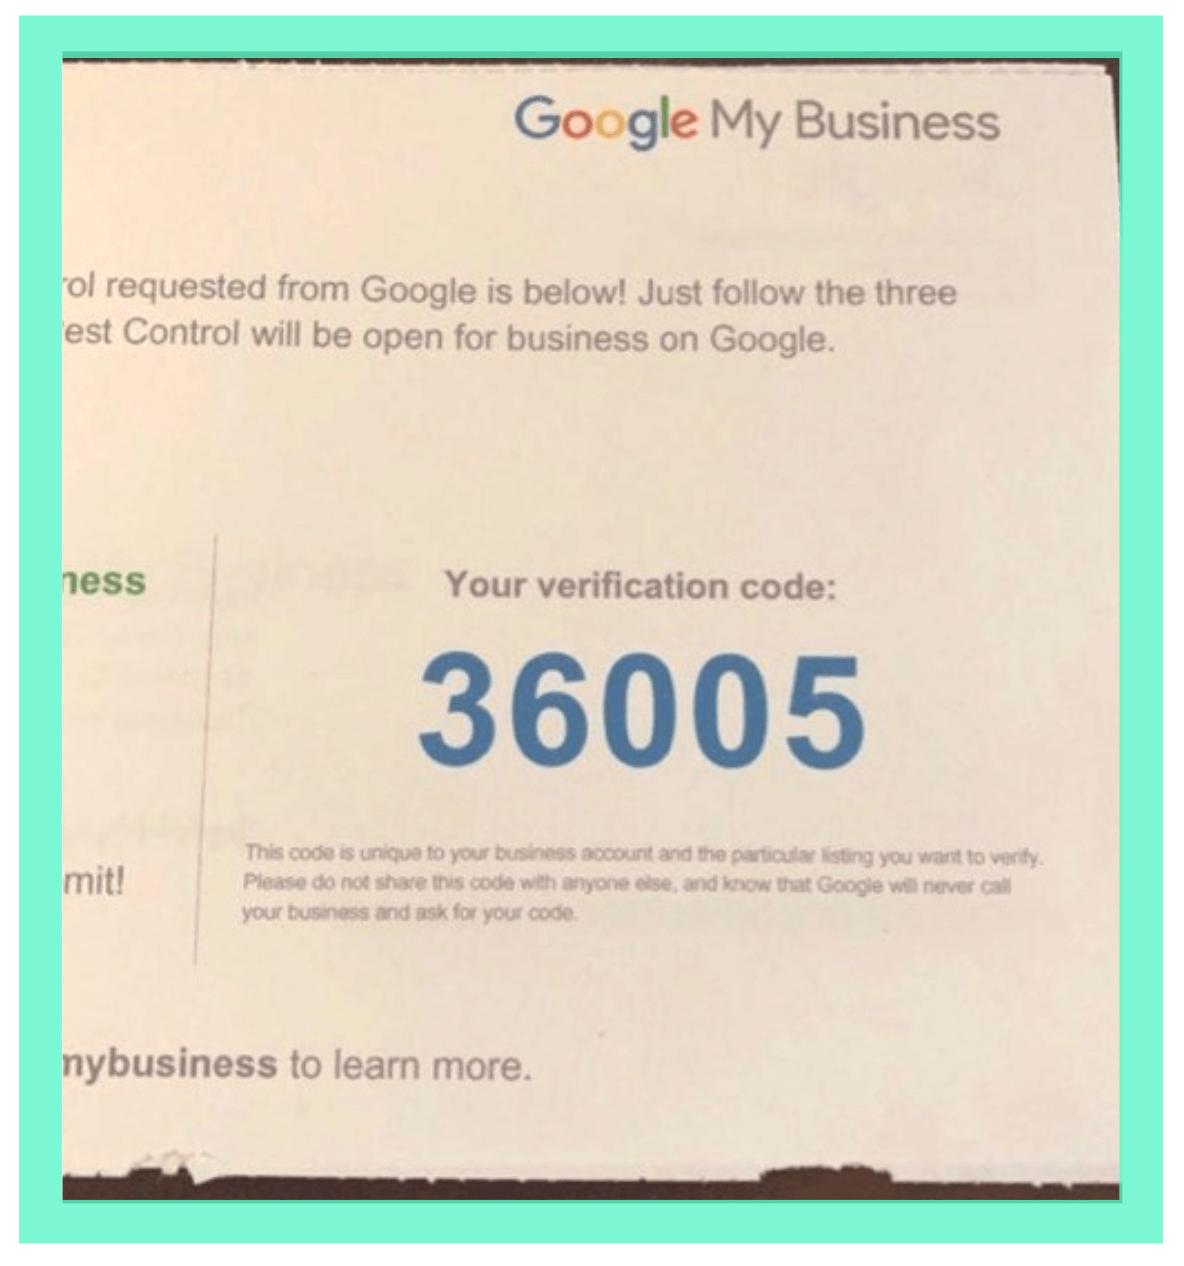 Google's verification code postcard